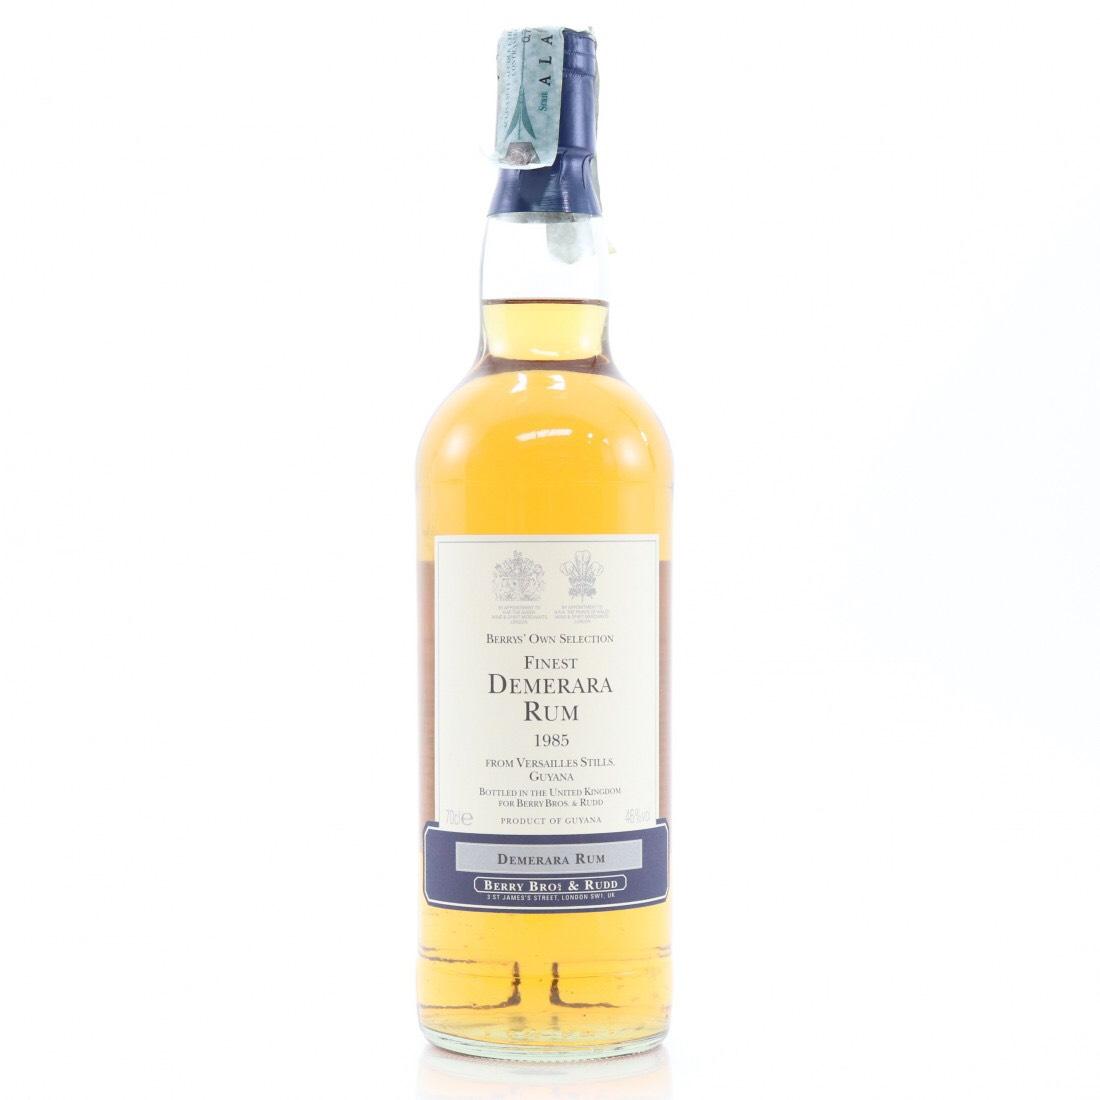 Bottle image of Finest Demerara Rum